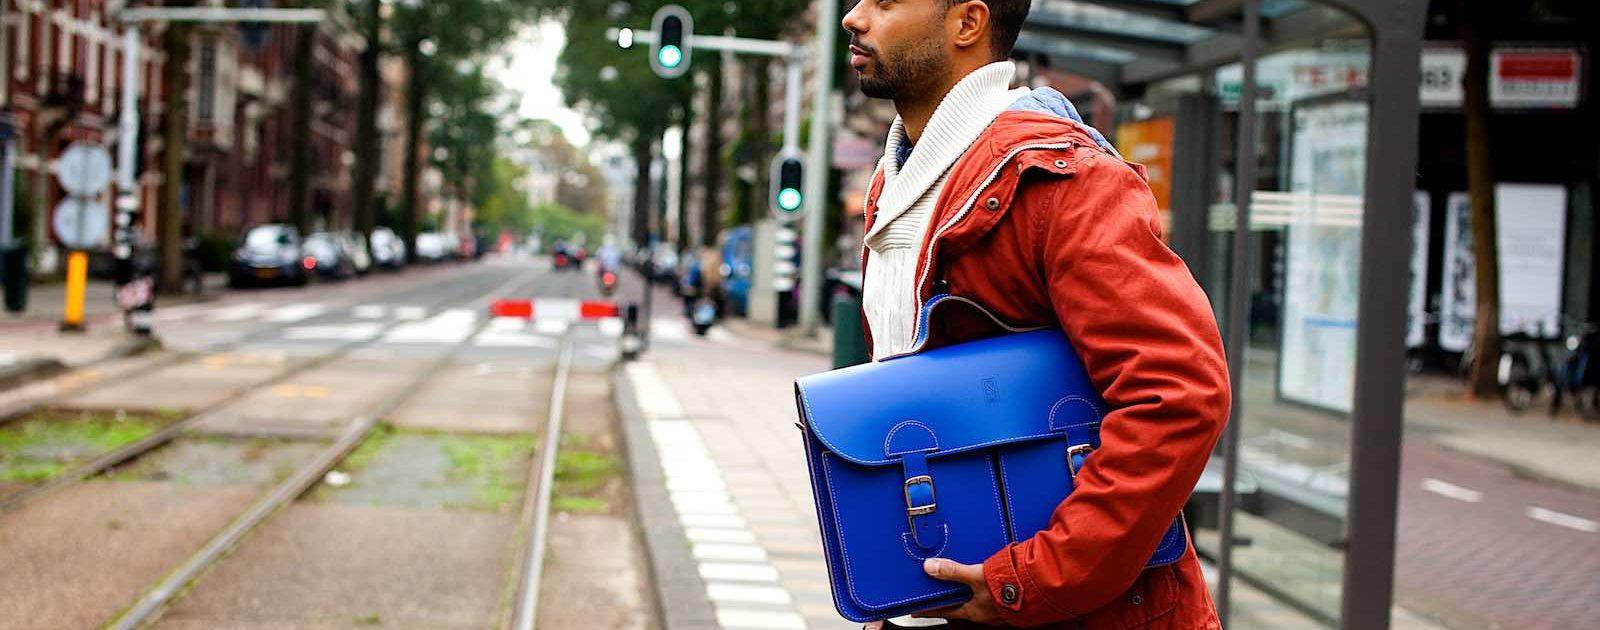 Buy a satchel? Beautiful OldSchoolBags satchel in cobalt blue